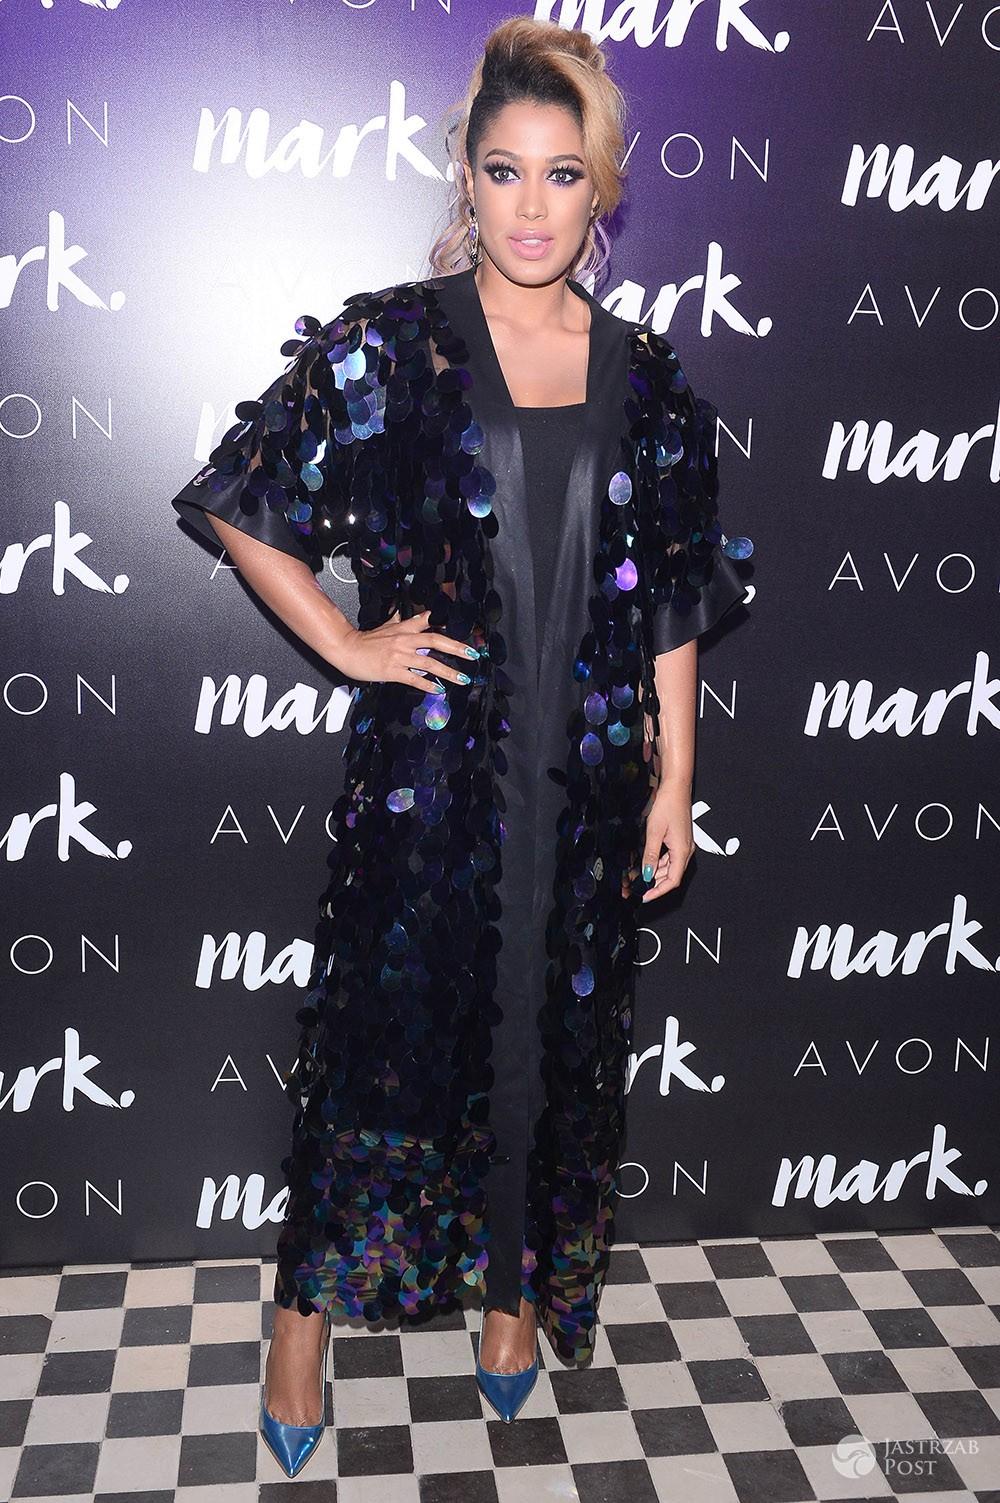 Patricia Kazadi - Avon Mark 2017